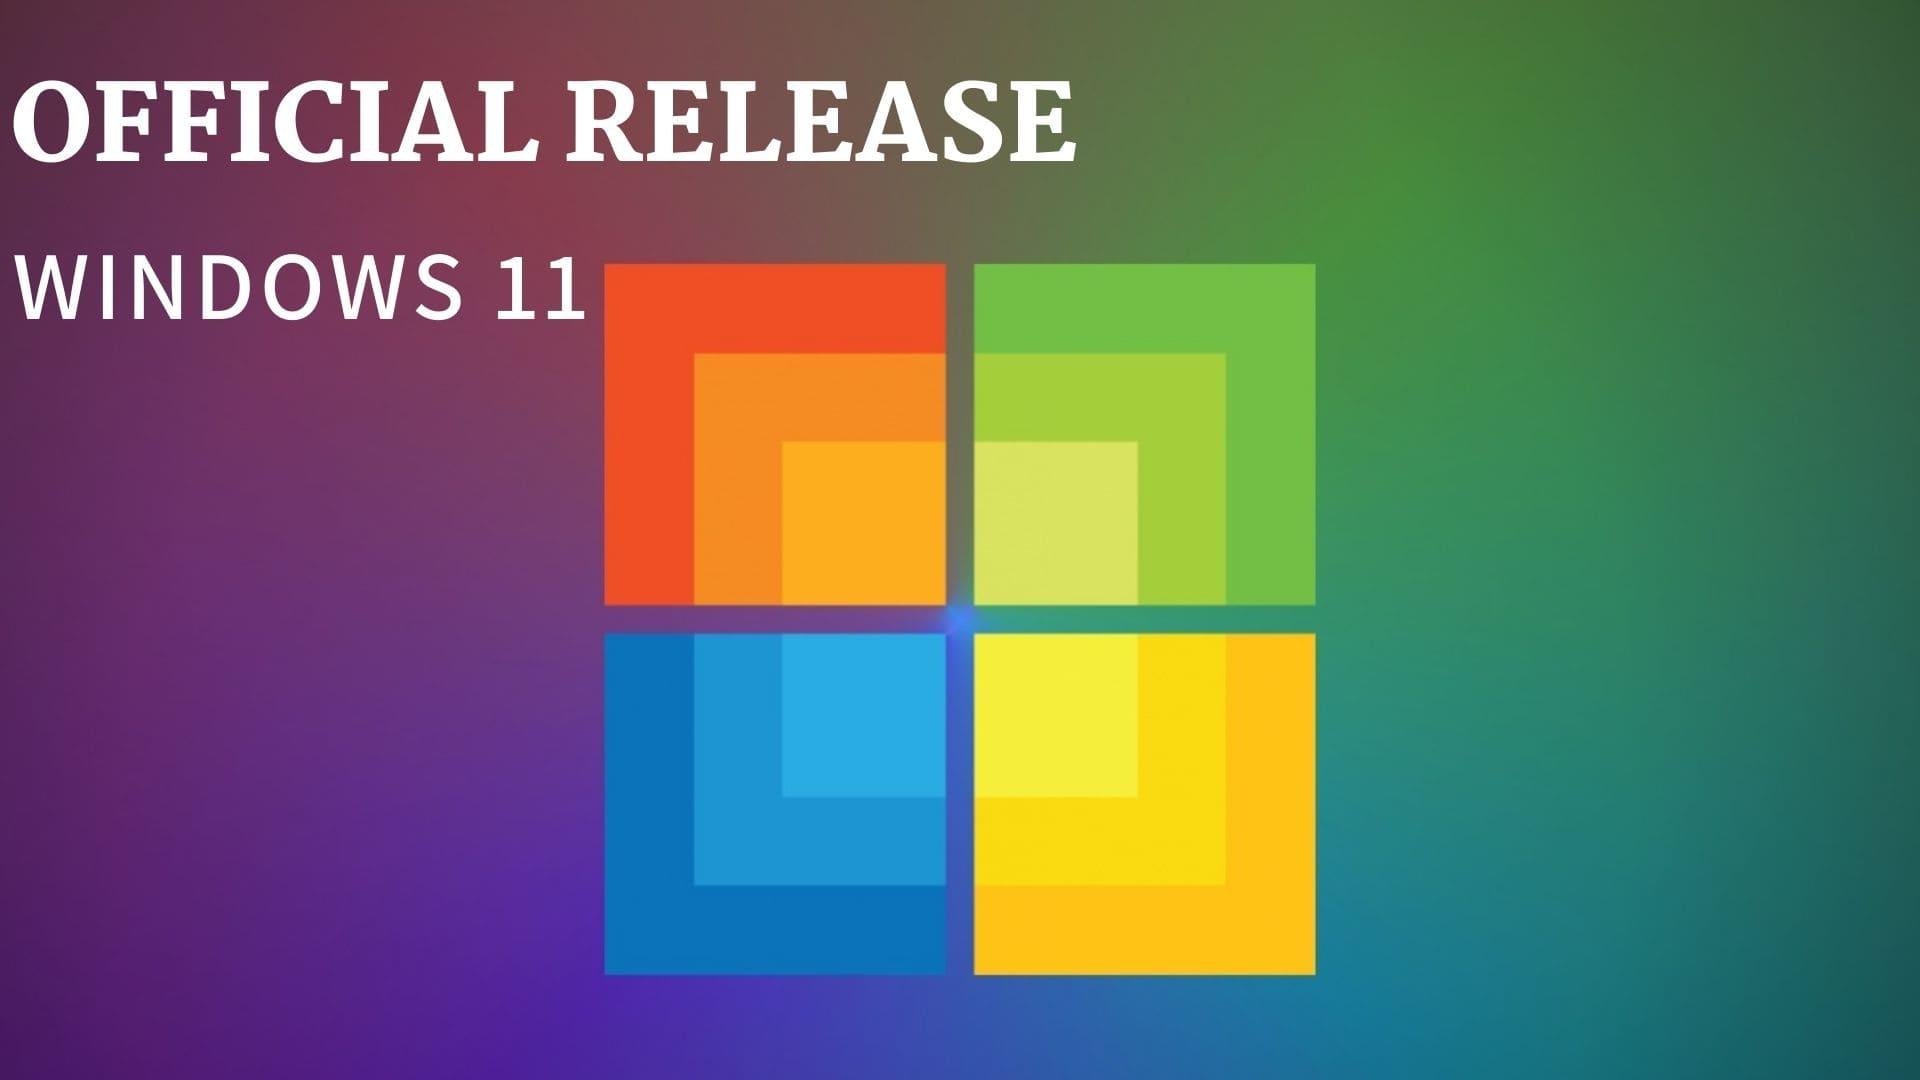 window 11 iso release